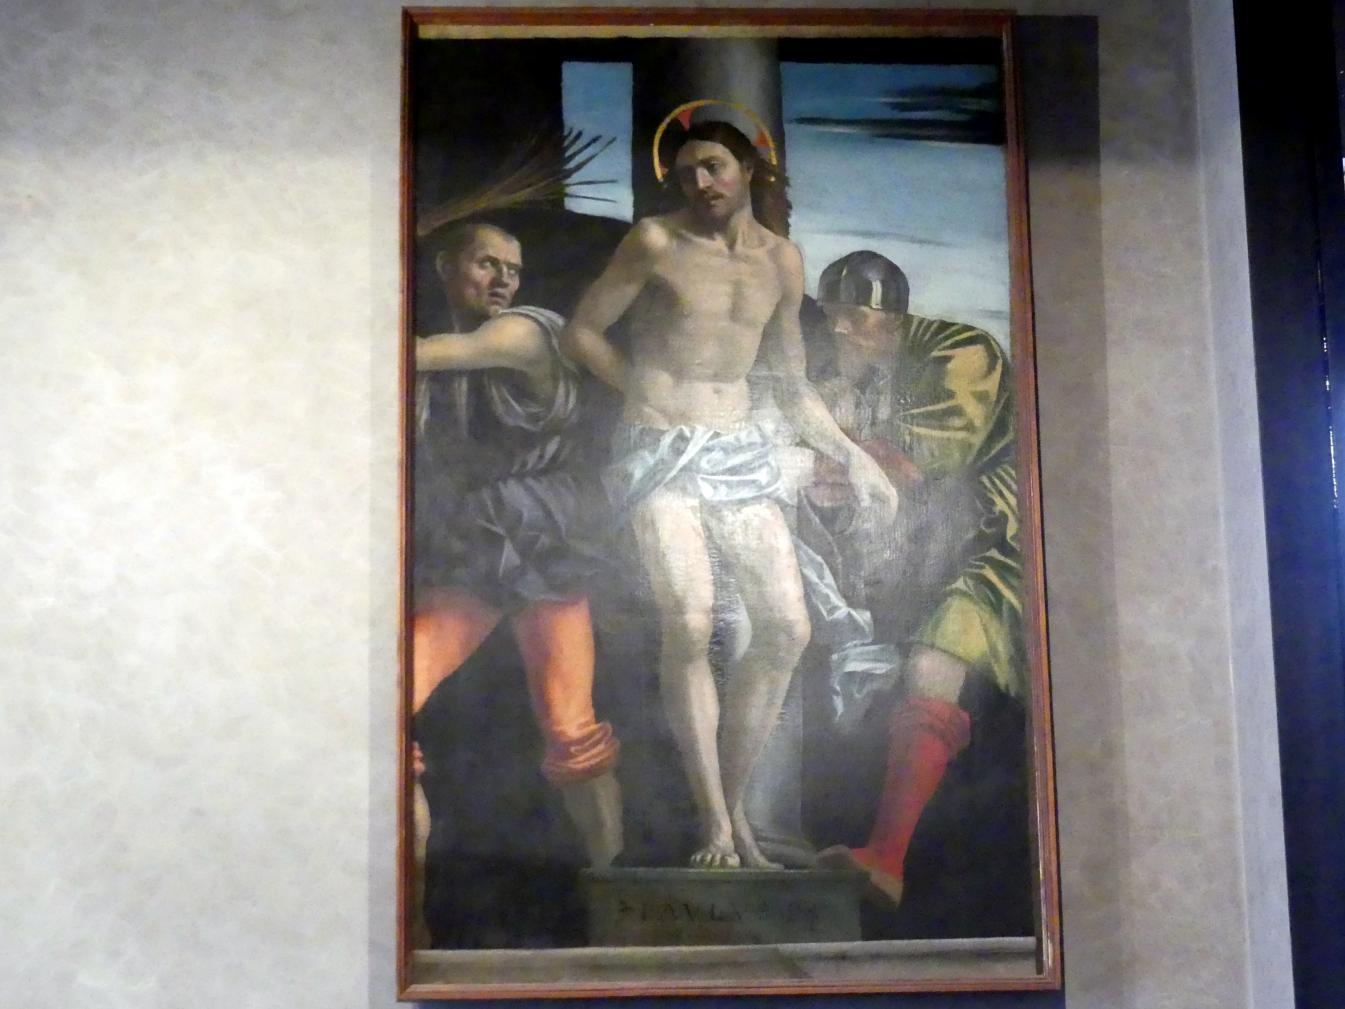 Paolo Morando (Cavazzola): Polyptichon der Passion, 1517, Bild 3/8